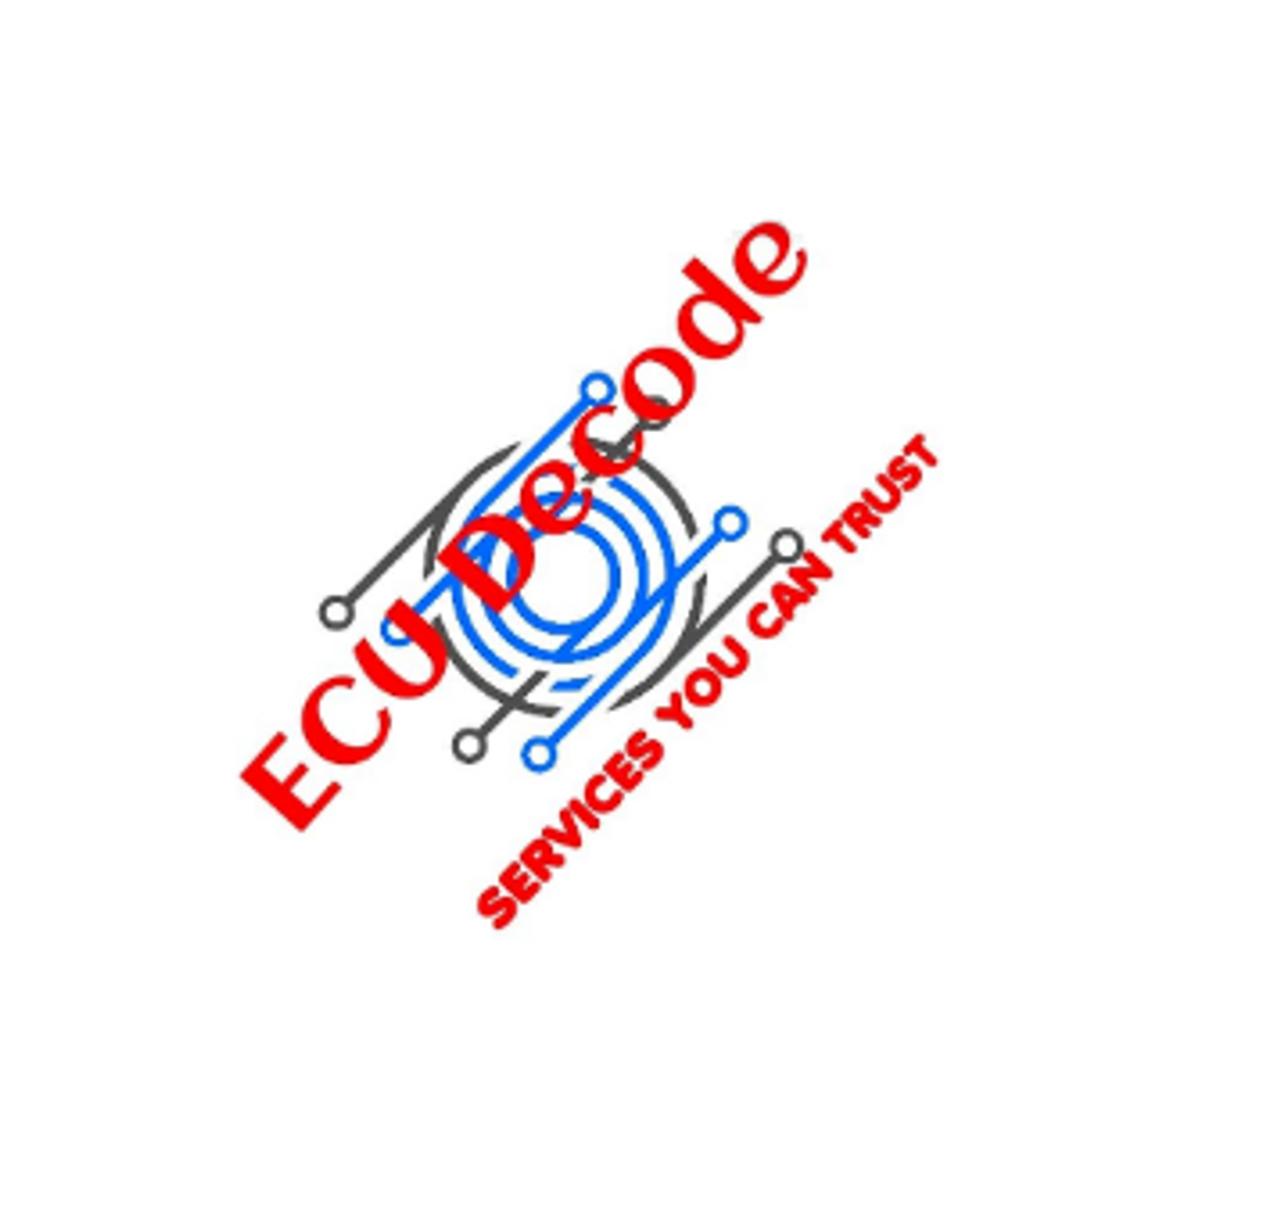 MEC32-210   D23604   Nissan Almera   Immobiliser Bypass Engine ECU Services